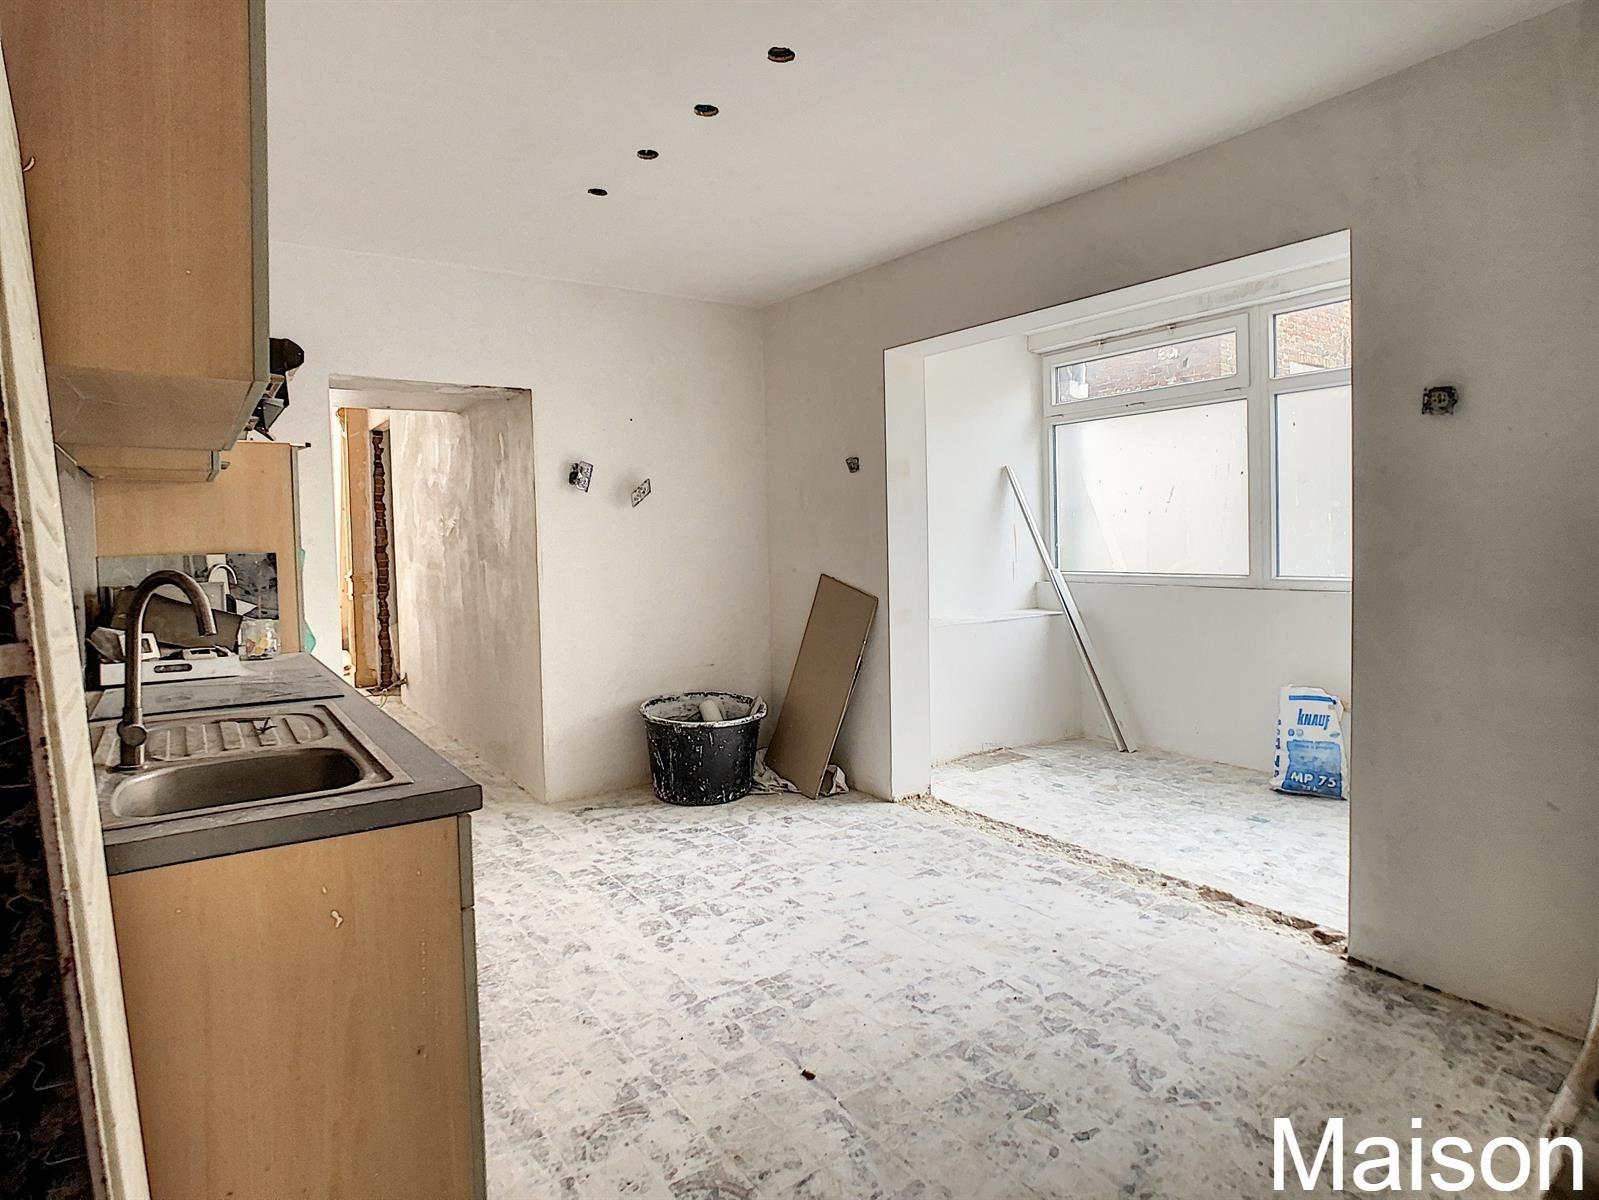 Maison - Villersla-Ville Marbais - #4407538-7